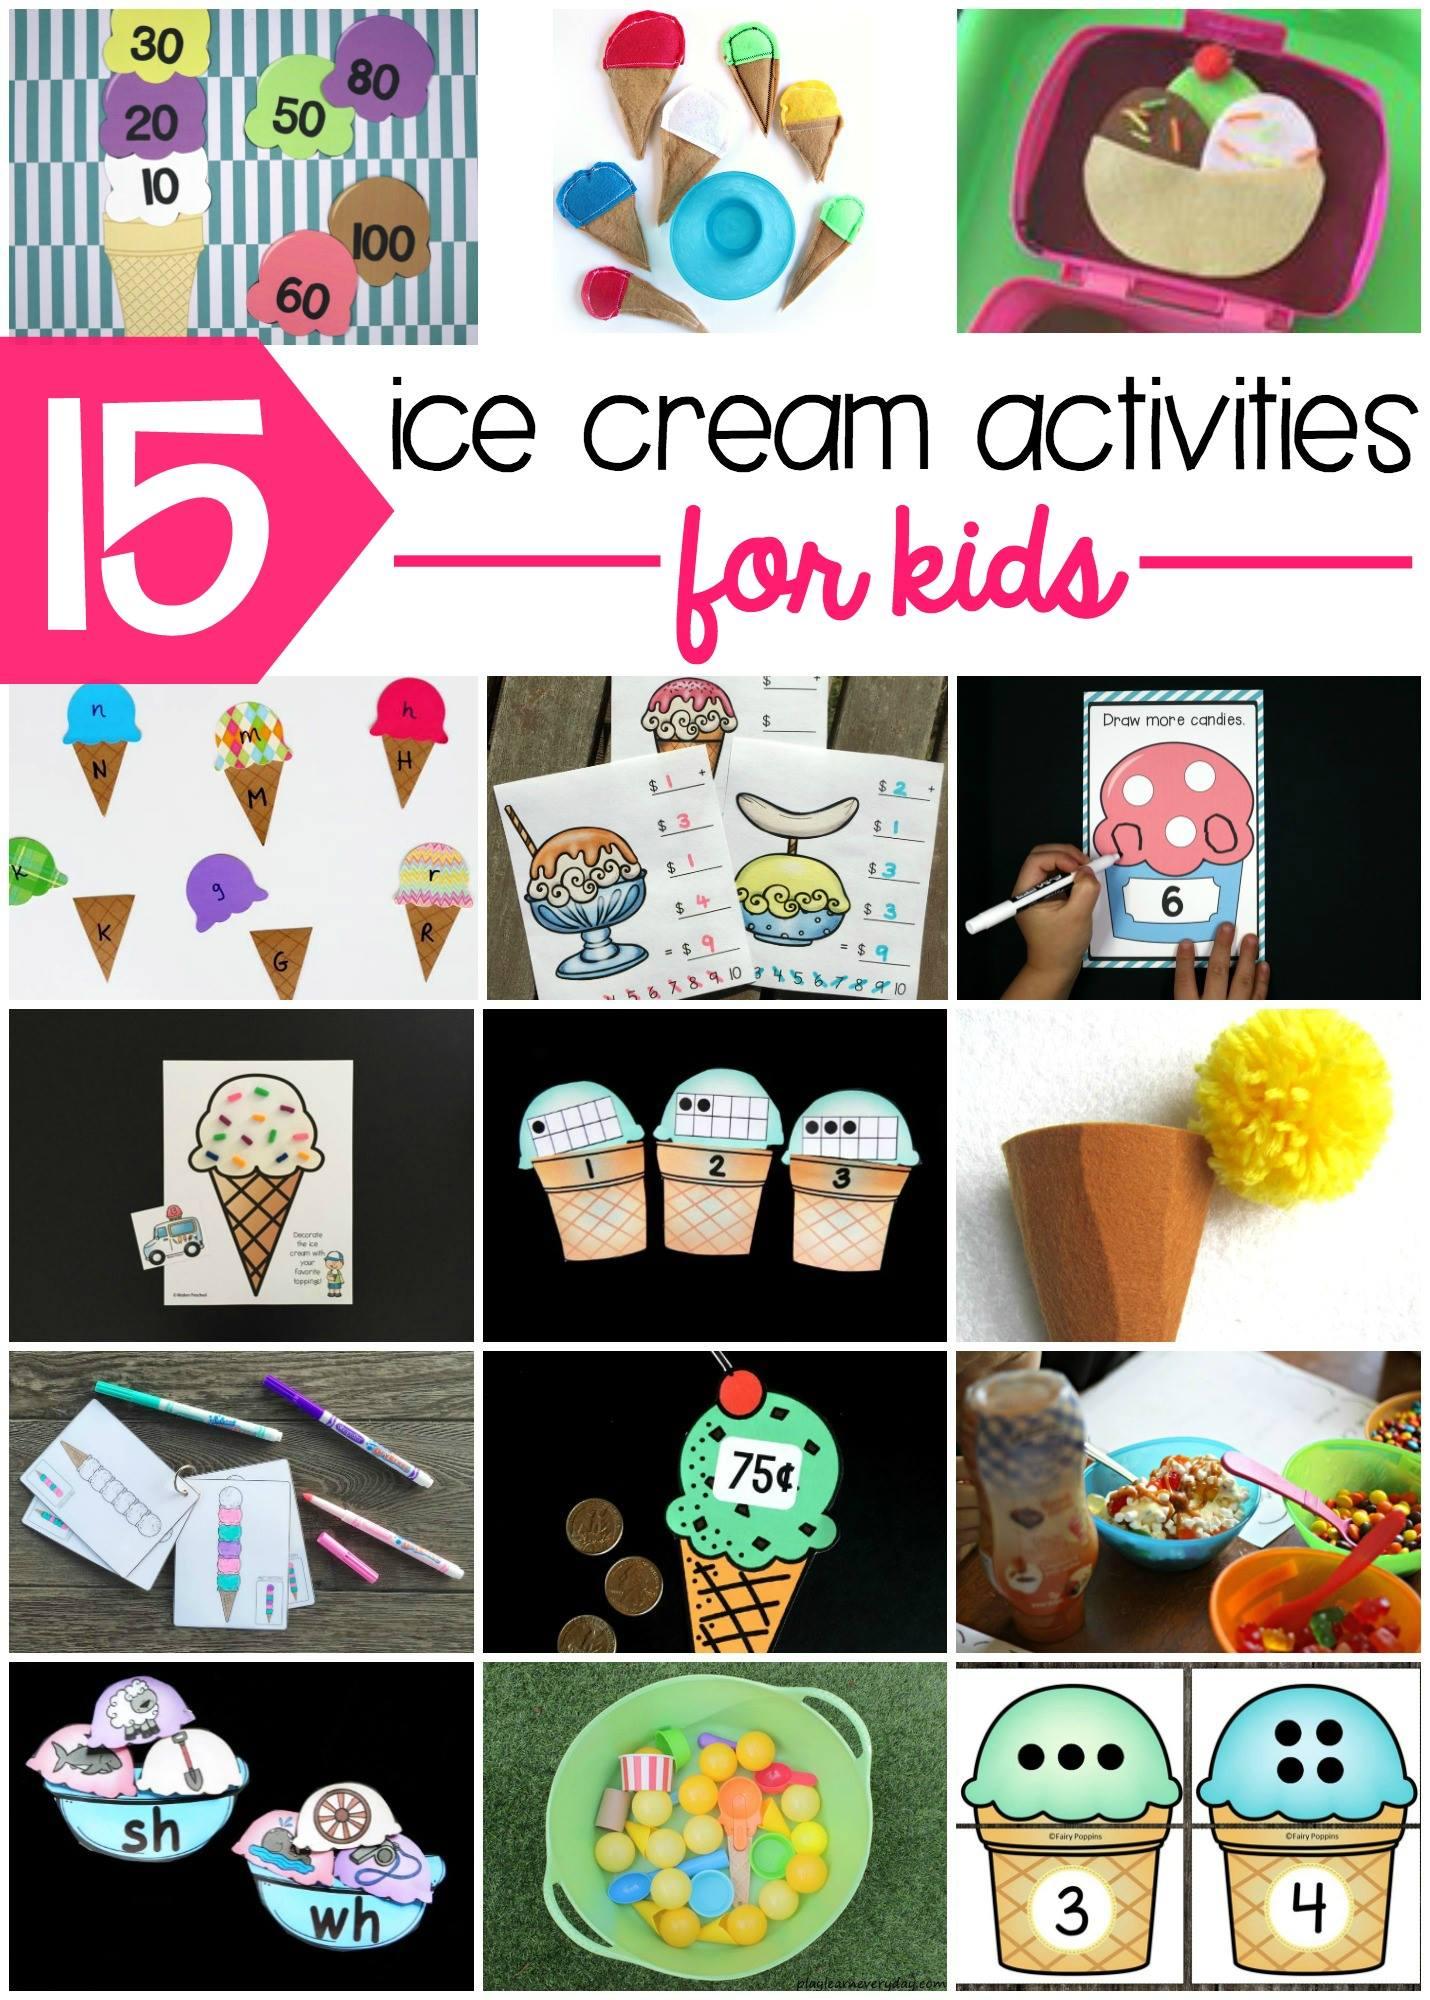 15 ice cream activities for kids